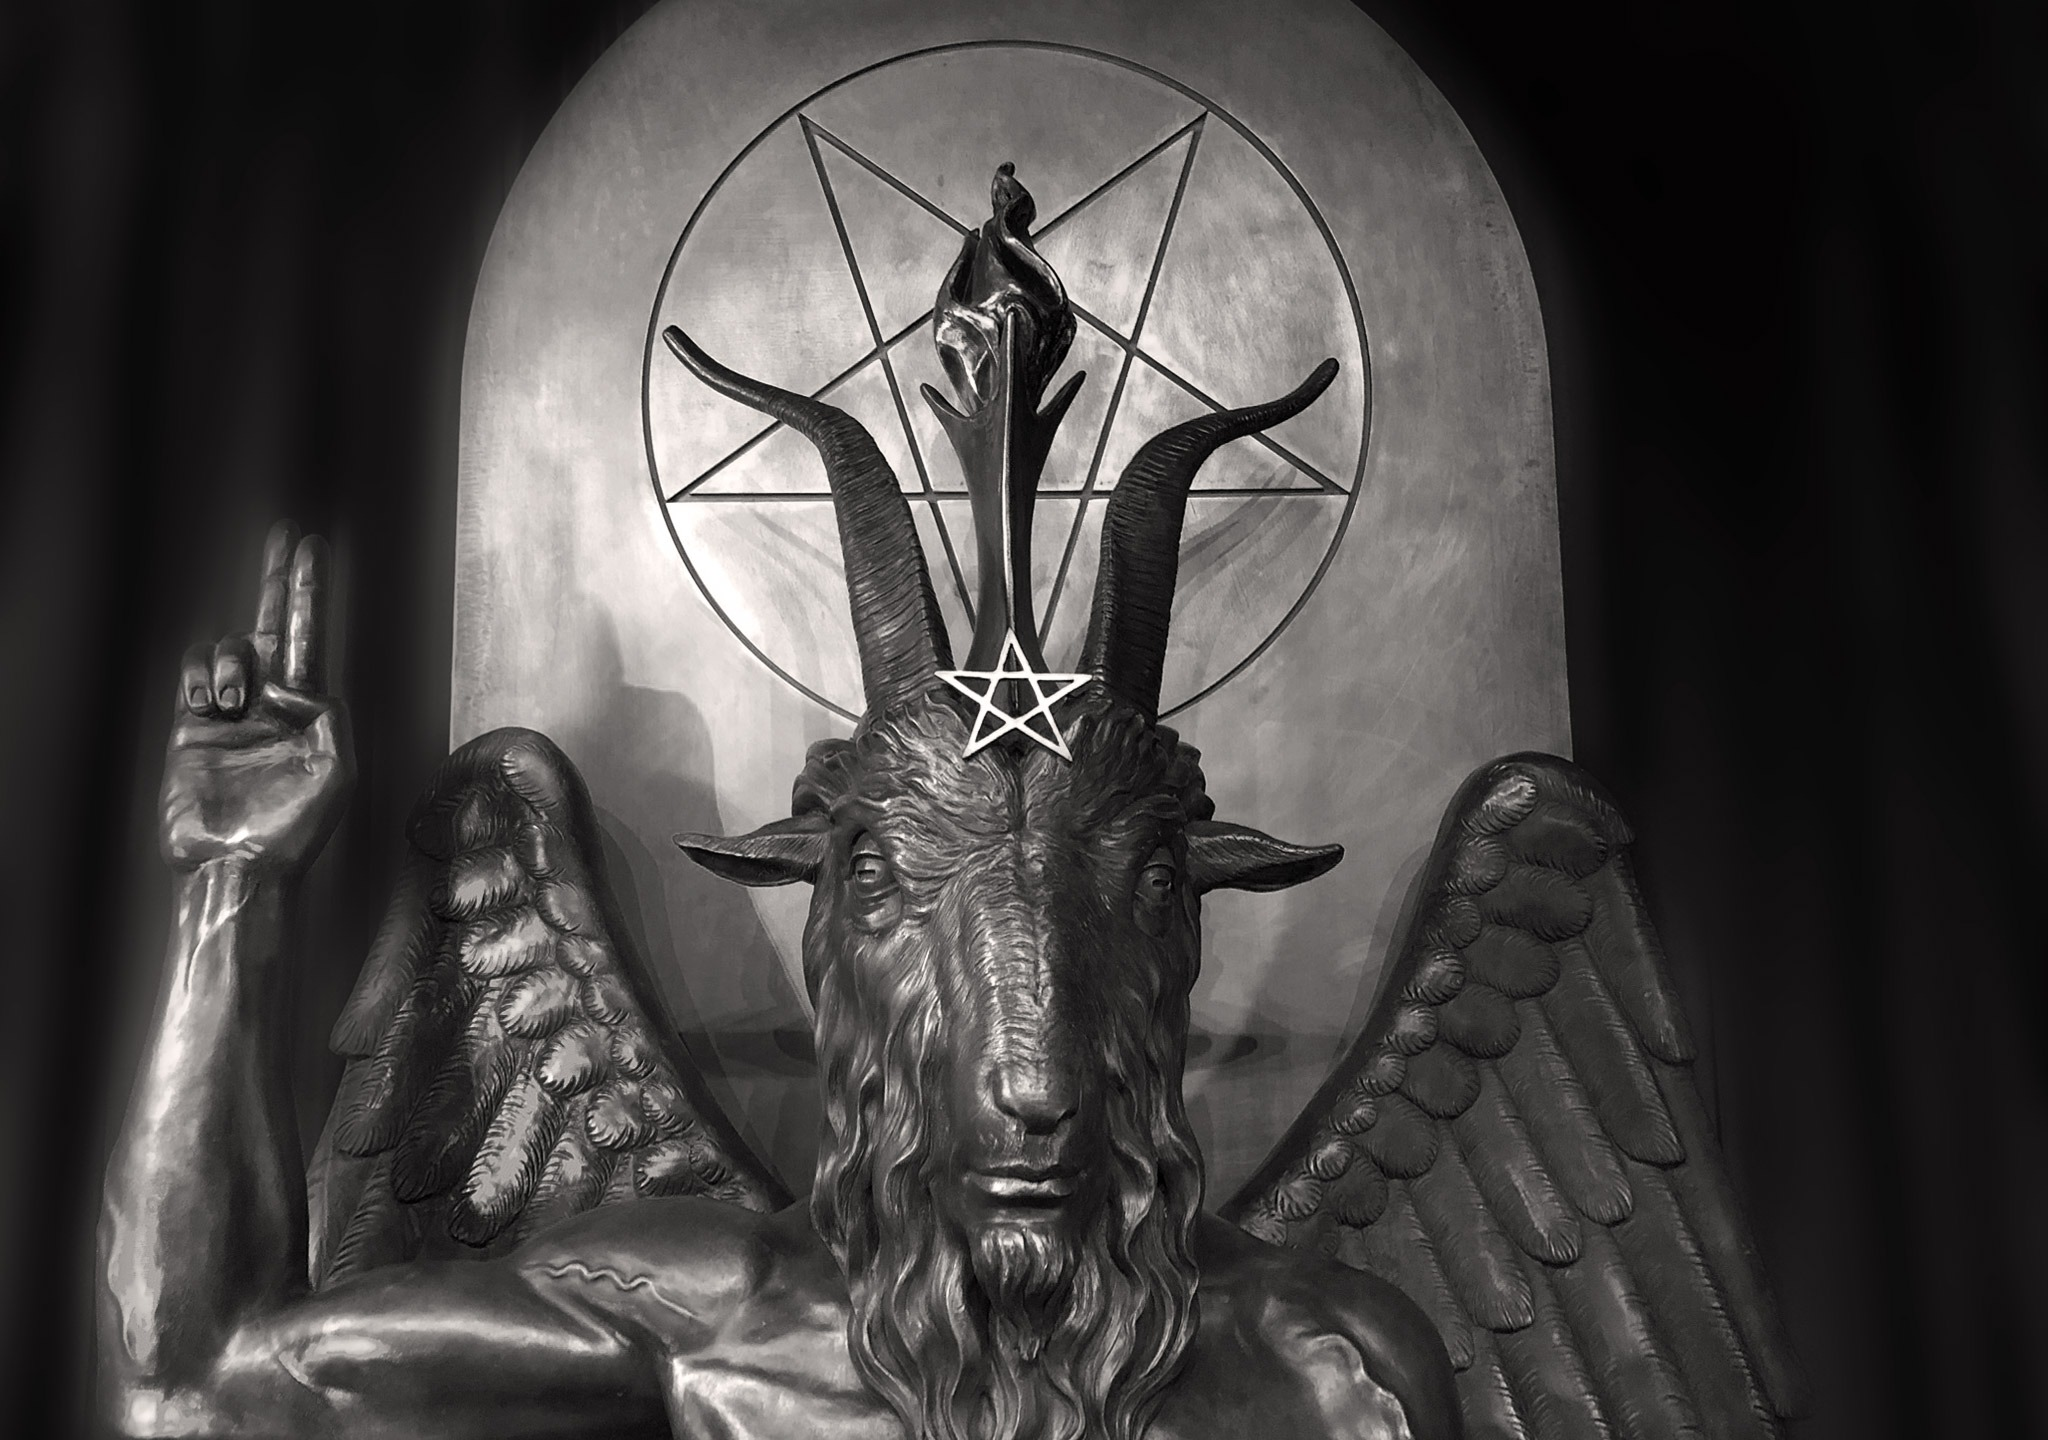 MasonVeraPaine, Mason Paine, MasonVeraPaine.com, Unabridged Millennial, Millennial, WGNRadio.com, MVP.Show, Chicago, Illinois, WGN Radio, Lifestyle, Team MVP, Satanic Temple, Kym LaRoux, Satanism, Religion, Hail Satan, Documentary, Satanist, Satan